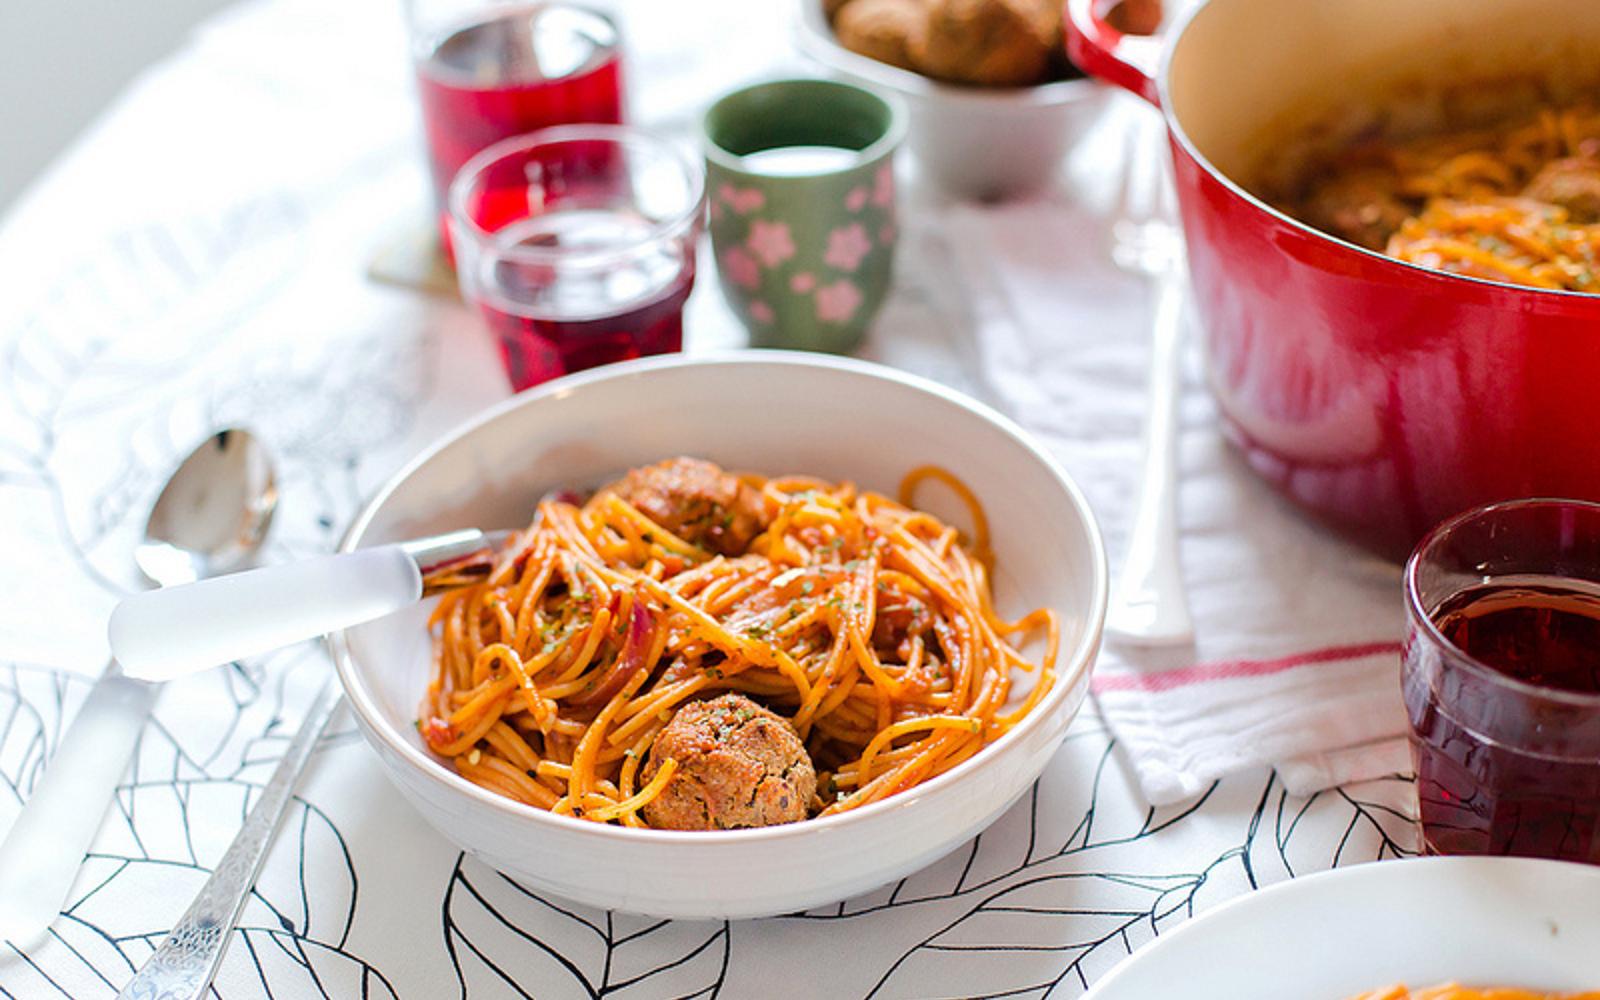 Vegan Gluten-Free Spaghetti With Black-Eyed Pea 'Meatballs'